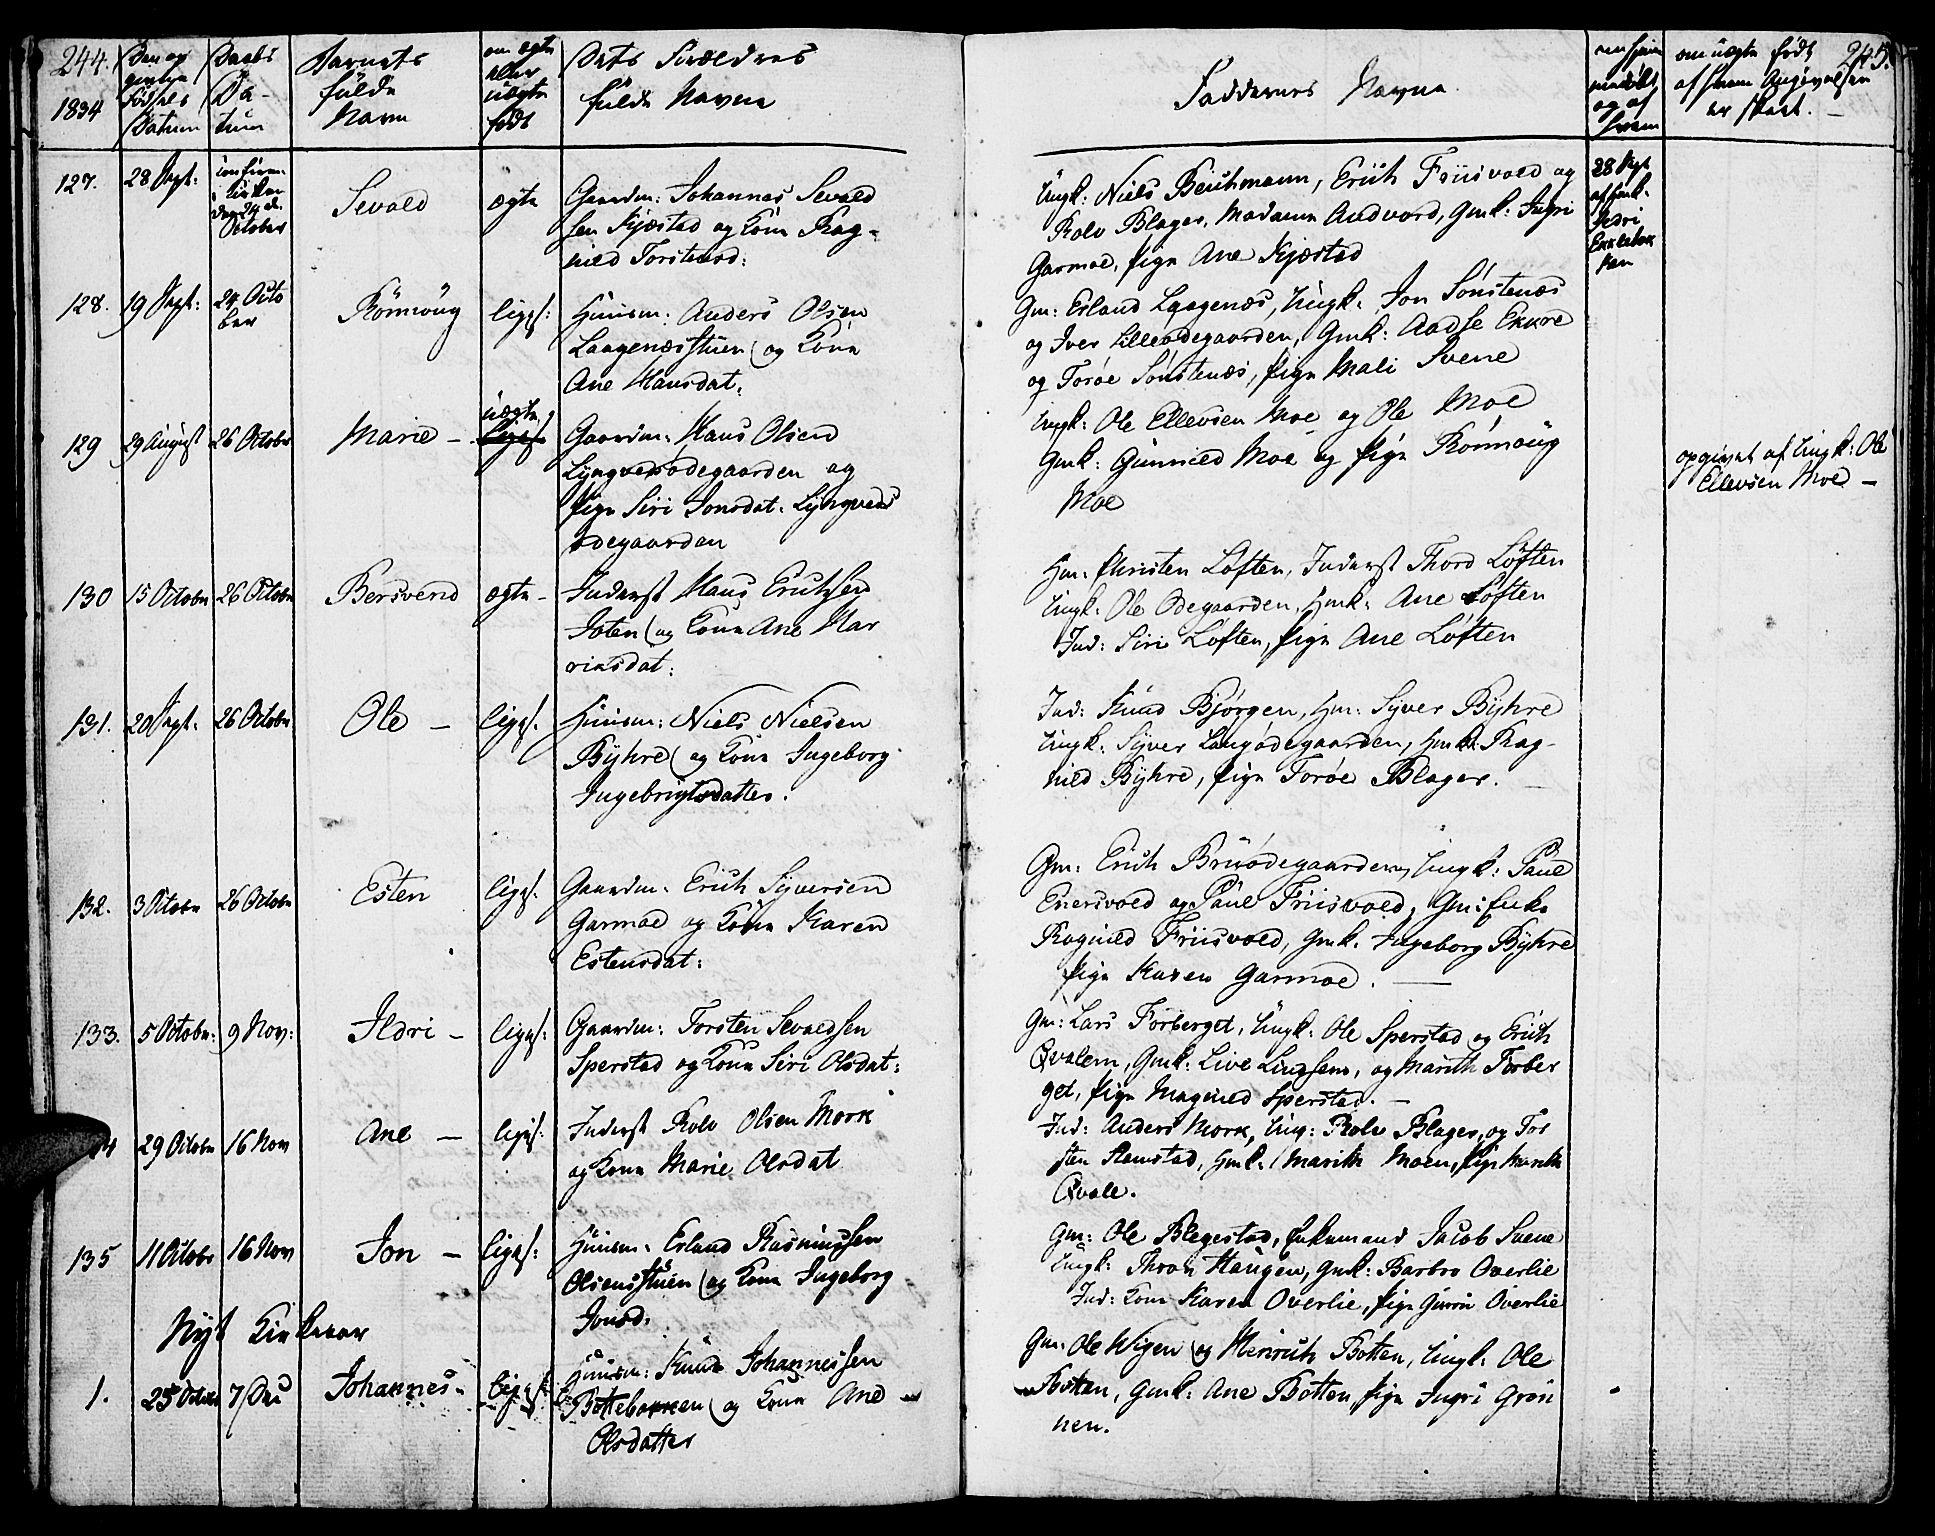 SAH, Lom prestekontor, K/L0005: Parish register (official) no. 5, 1825-1837, p. 244-245